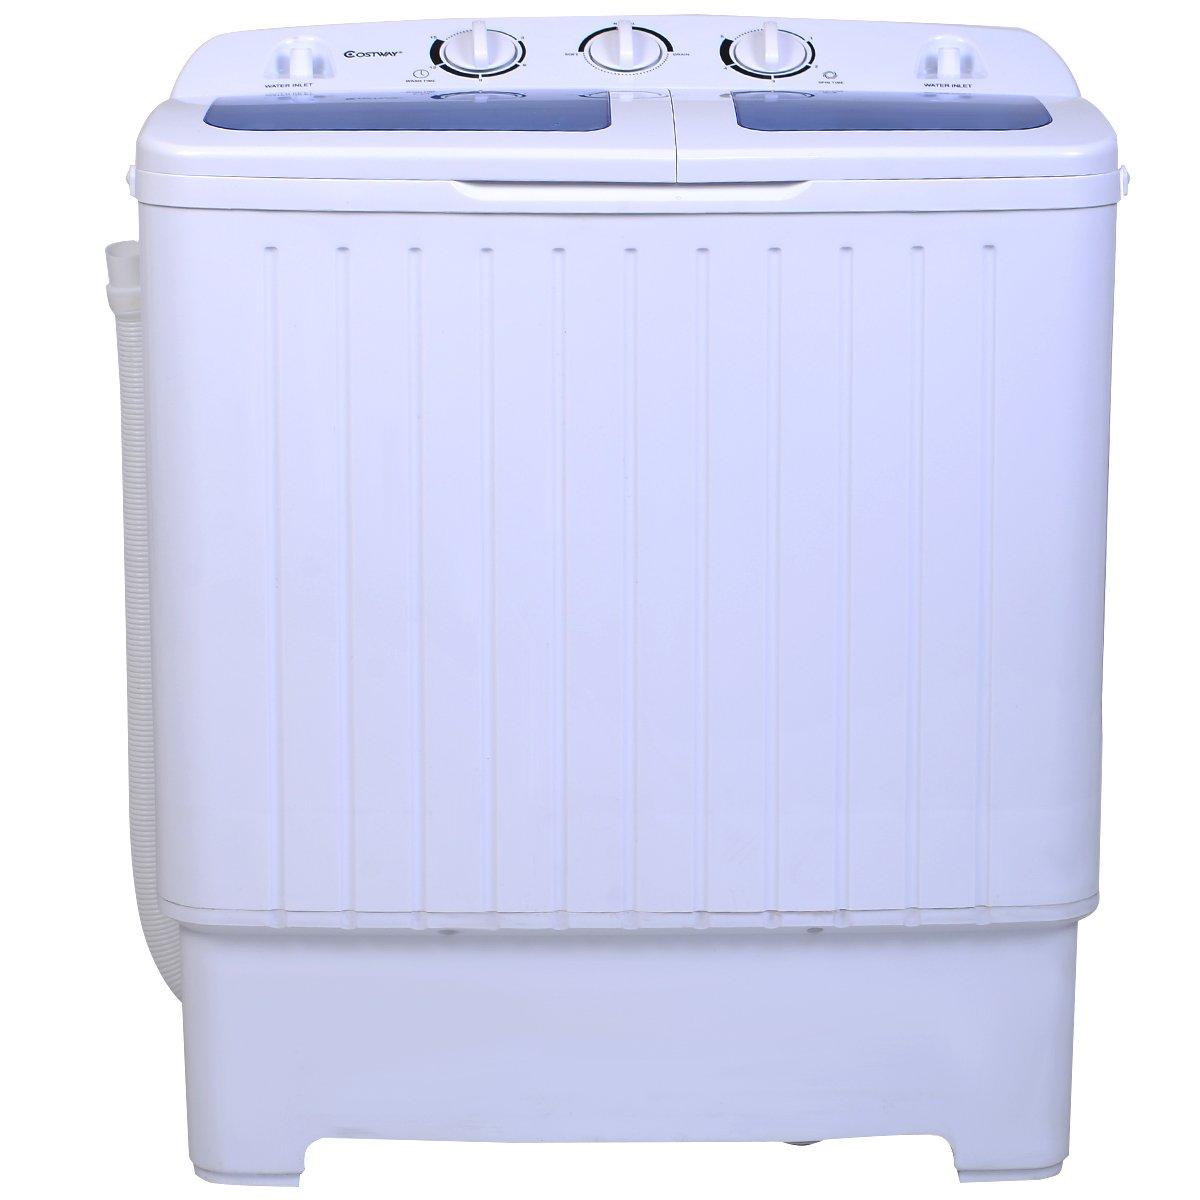 giantex portable mini compact twin tub washing machine washer spin cycle amazon. Black Bedroom Furniture Sets. Home Design Ideas